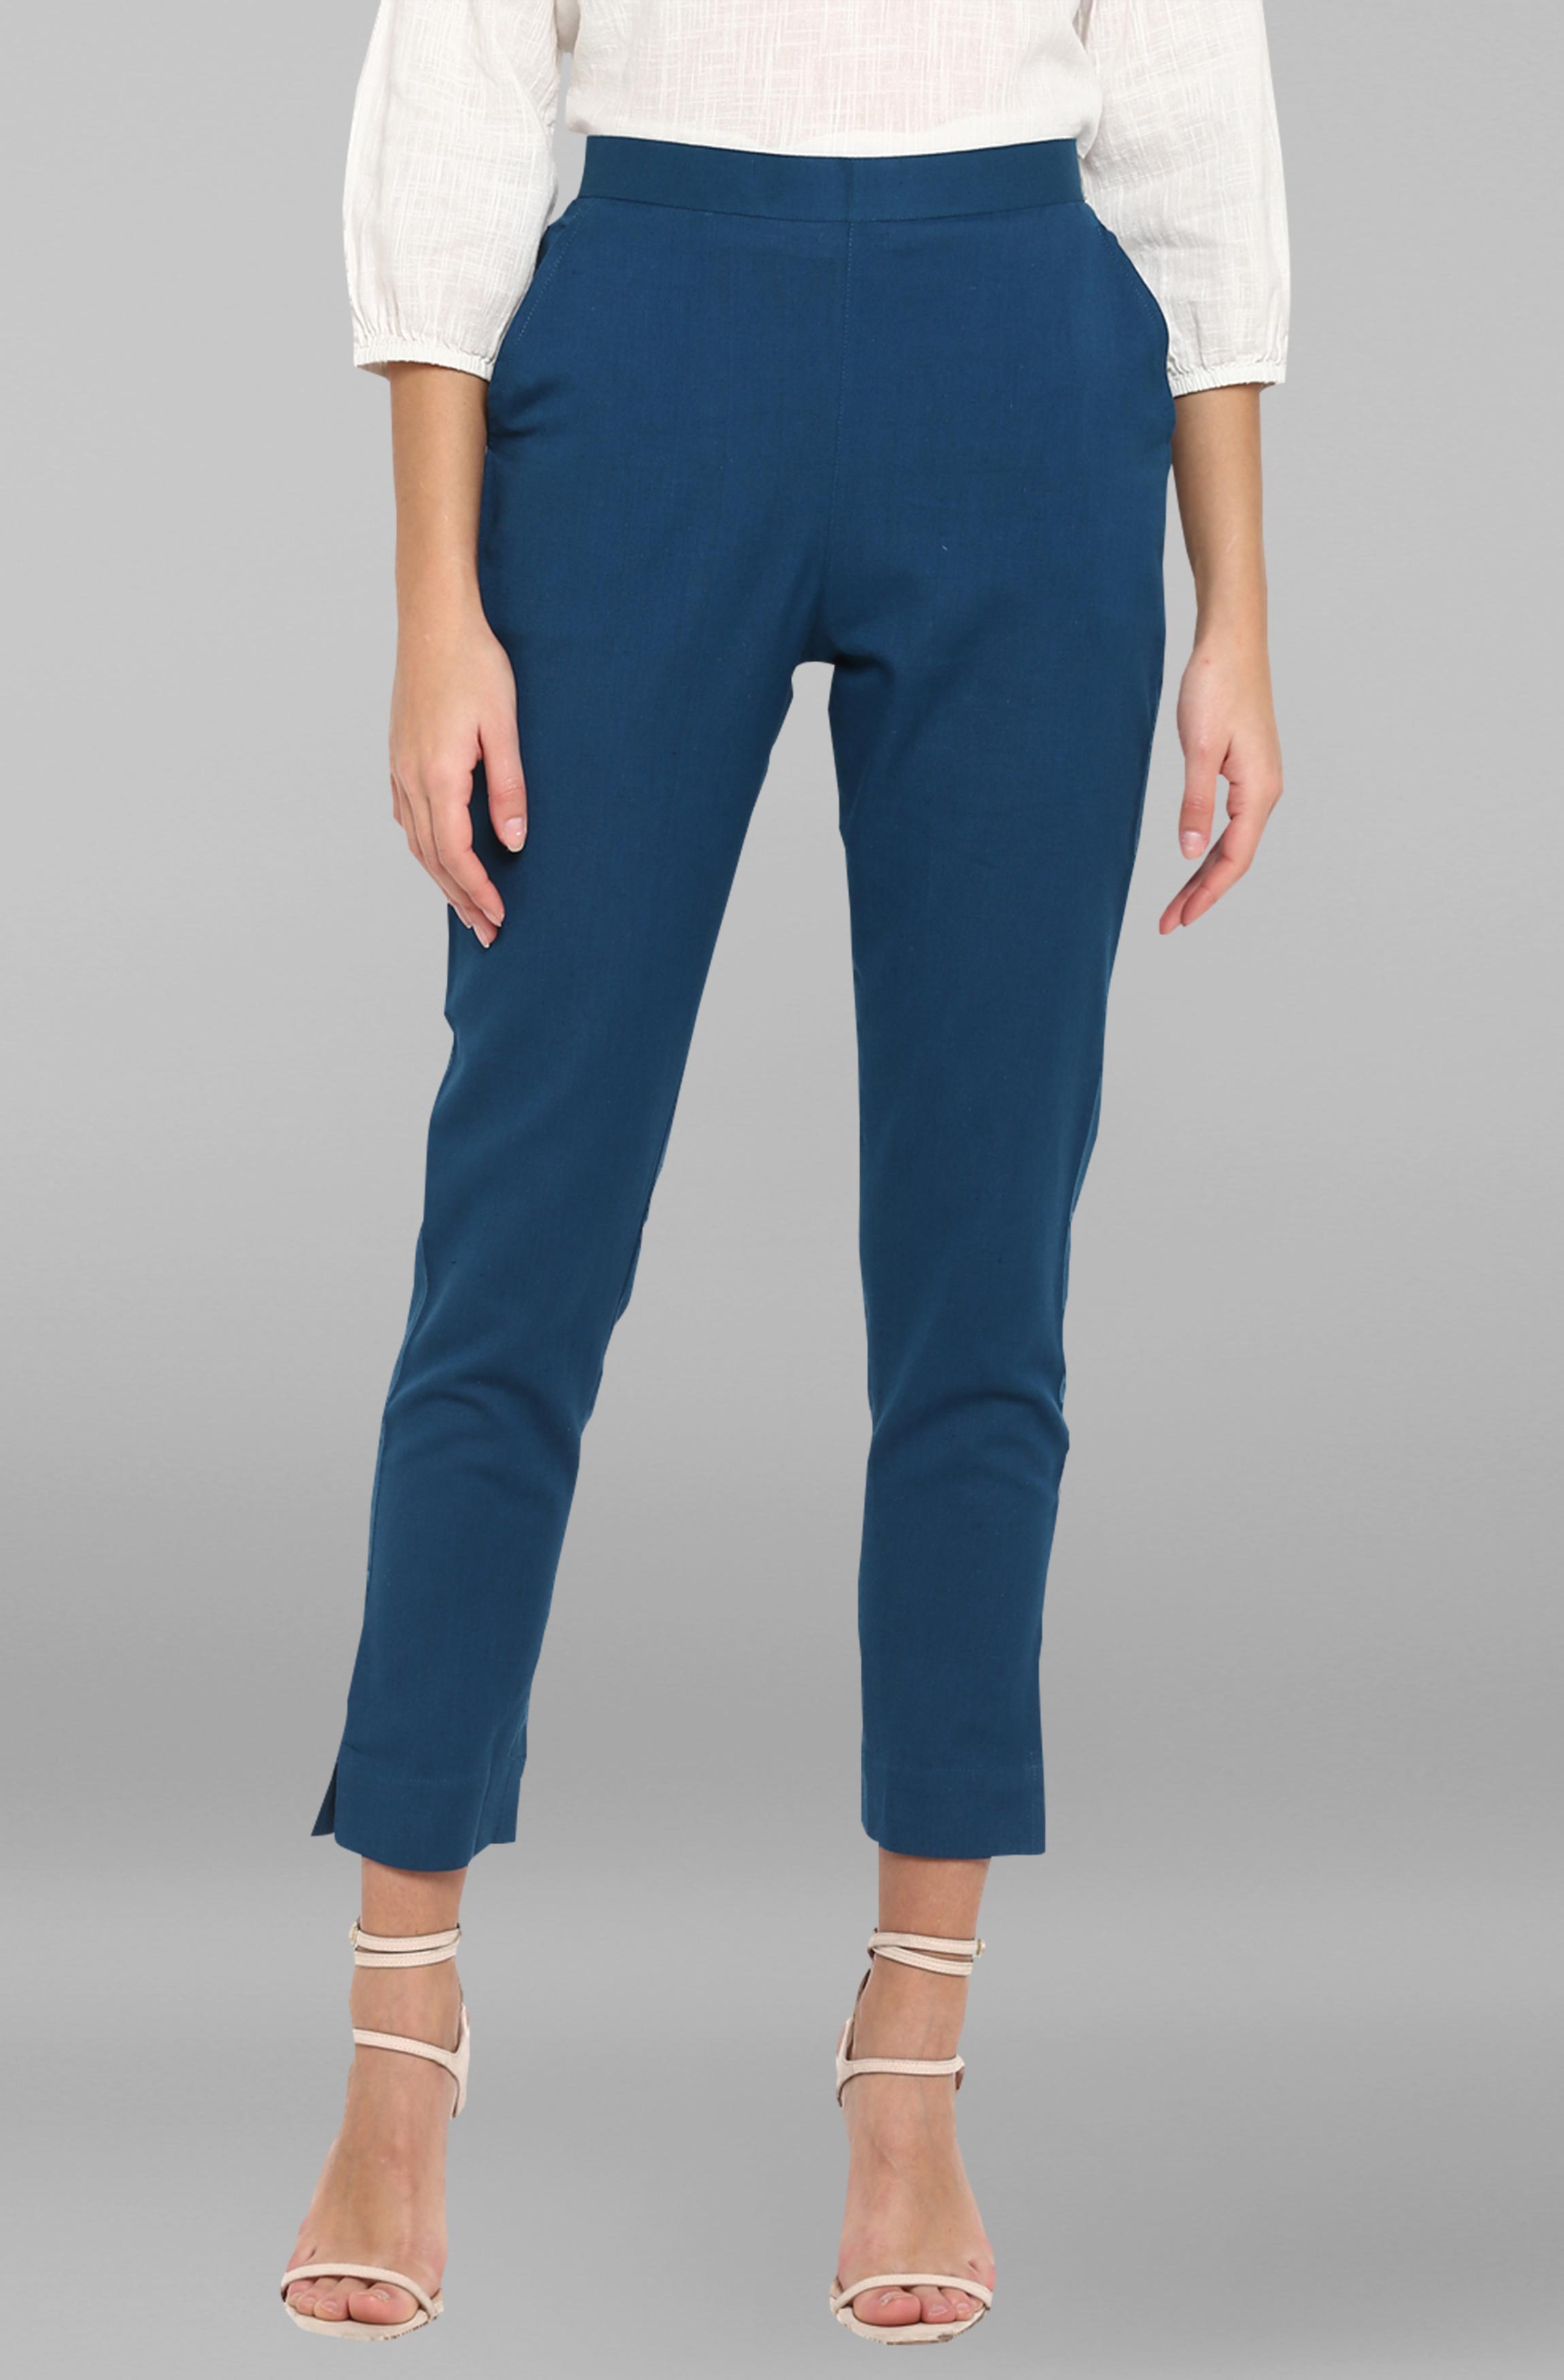 Janasya | Janasya Women's Turquoise Blue Pure Cotton Narrow Pant